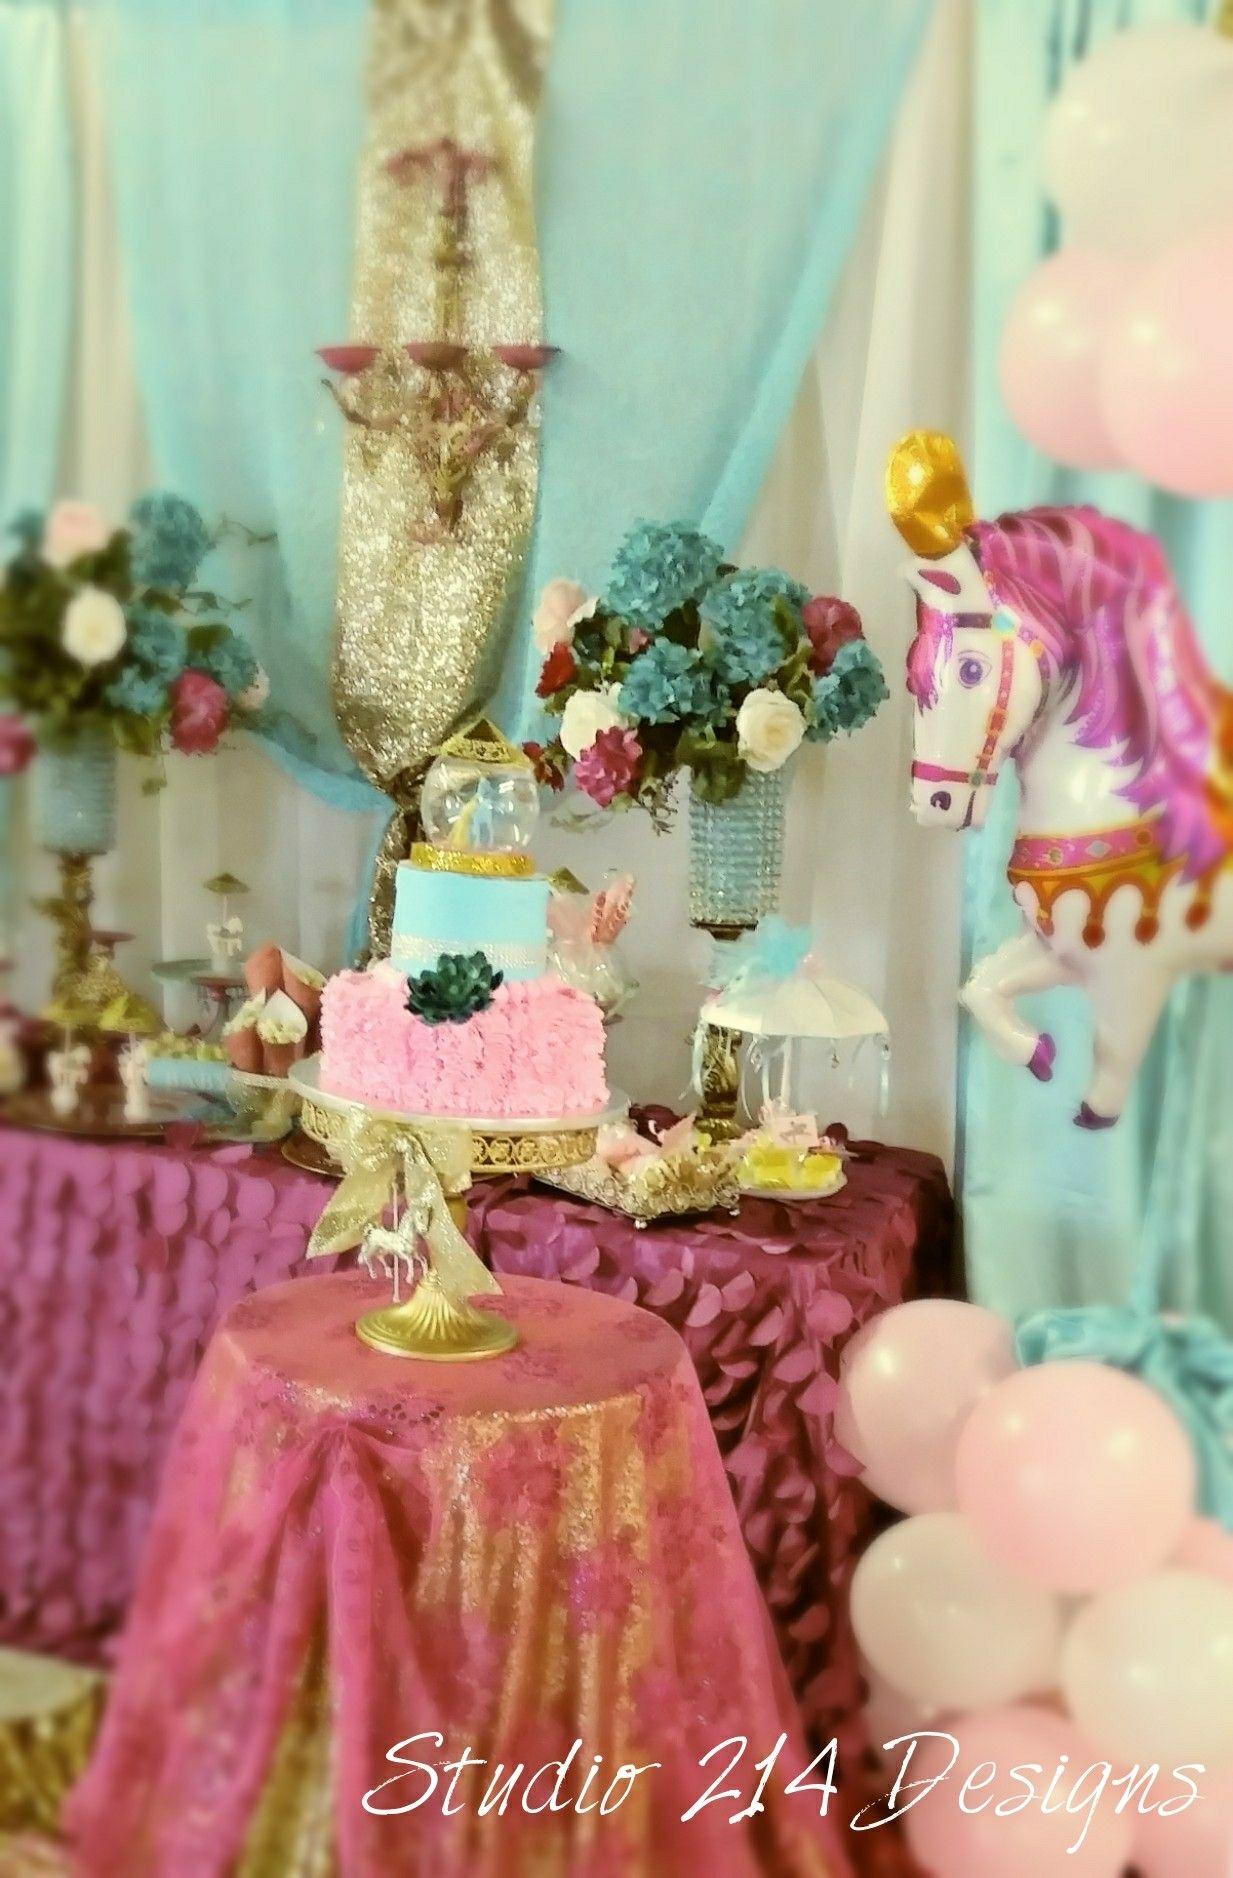 Carousel Party Dessert Table Carousel Party Dessert